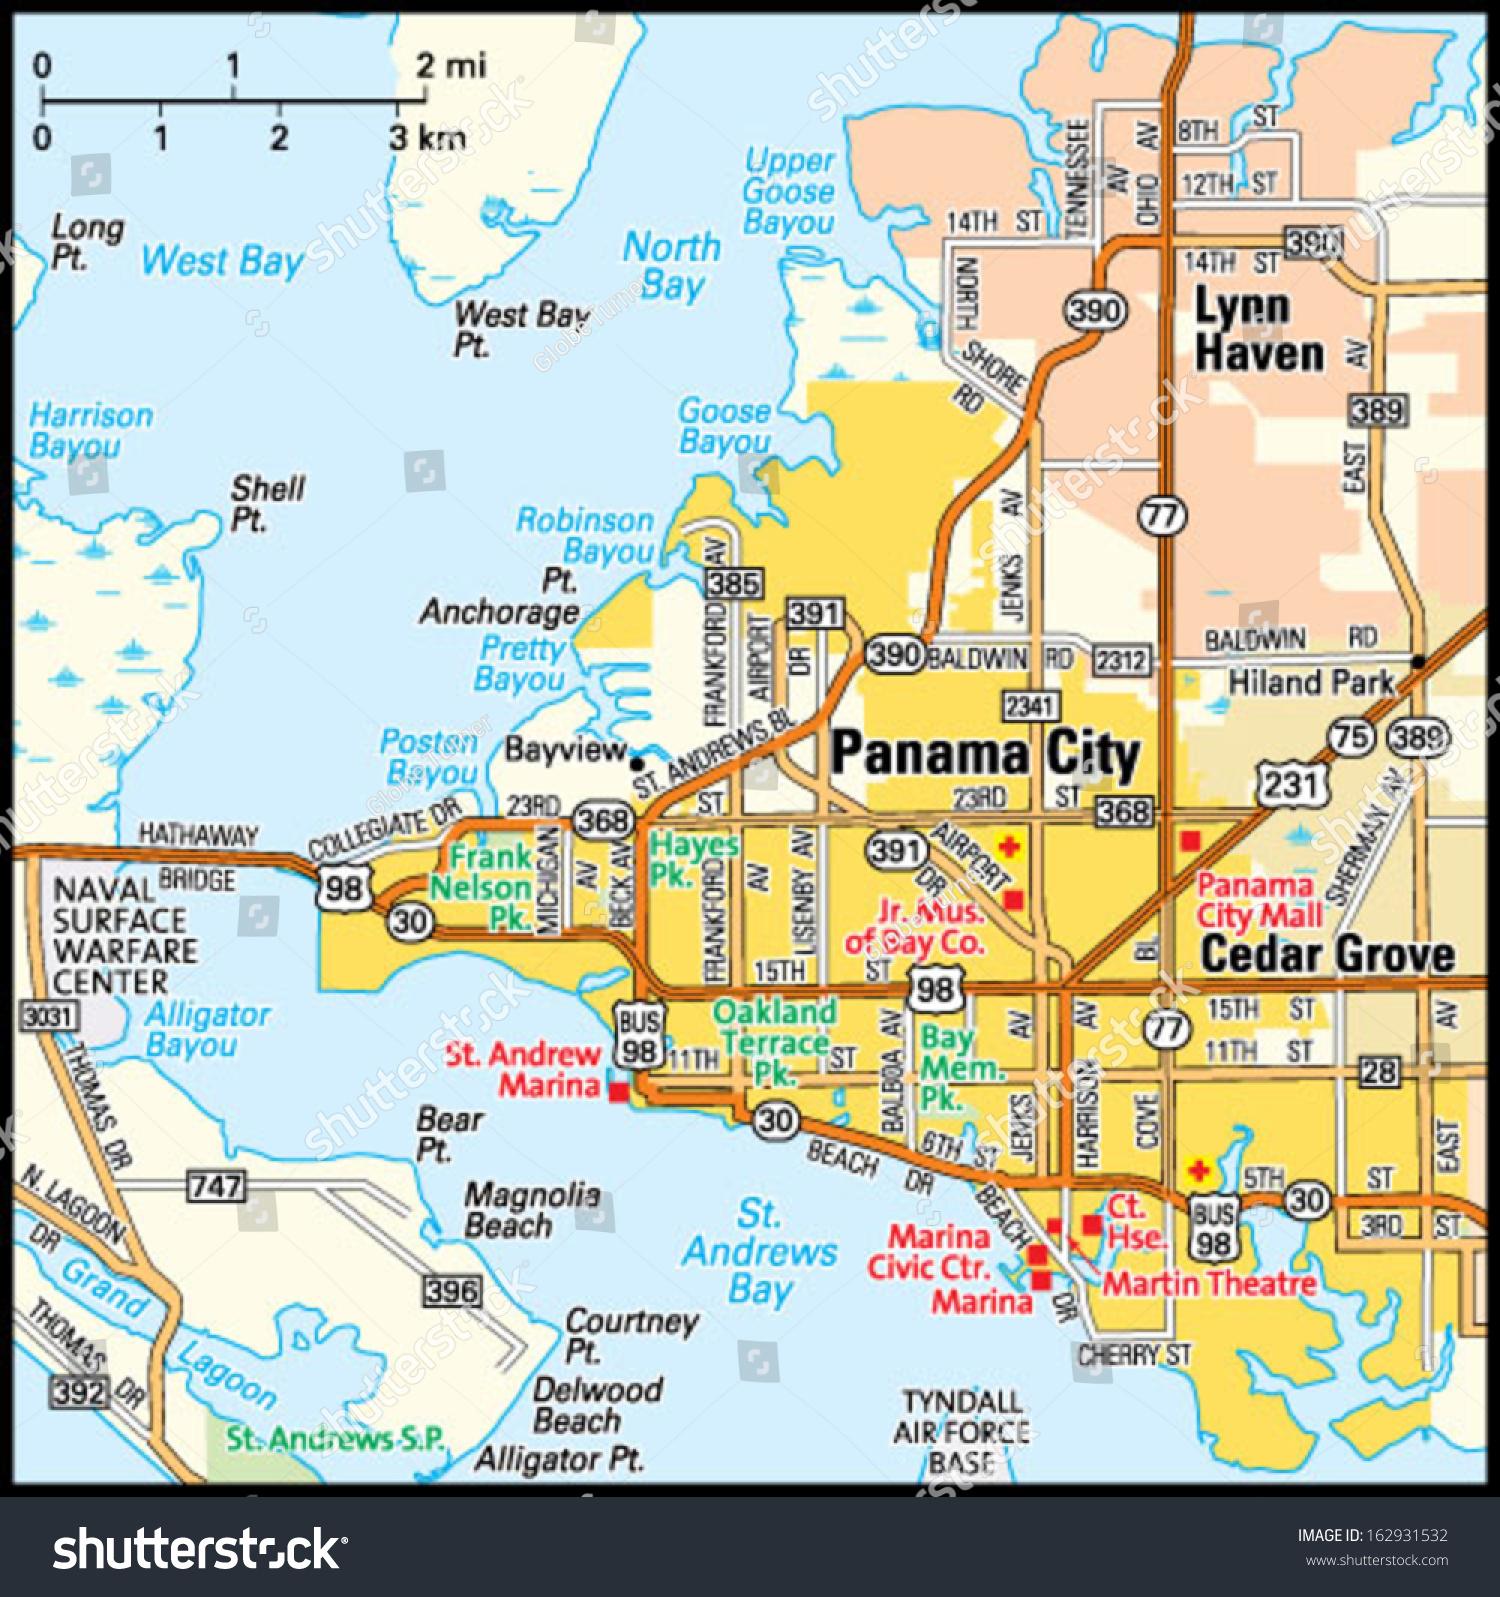 Map Of Panama City Beach Florida Downloadable World For On - D-Df - Panama Beach Florida Map